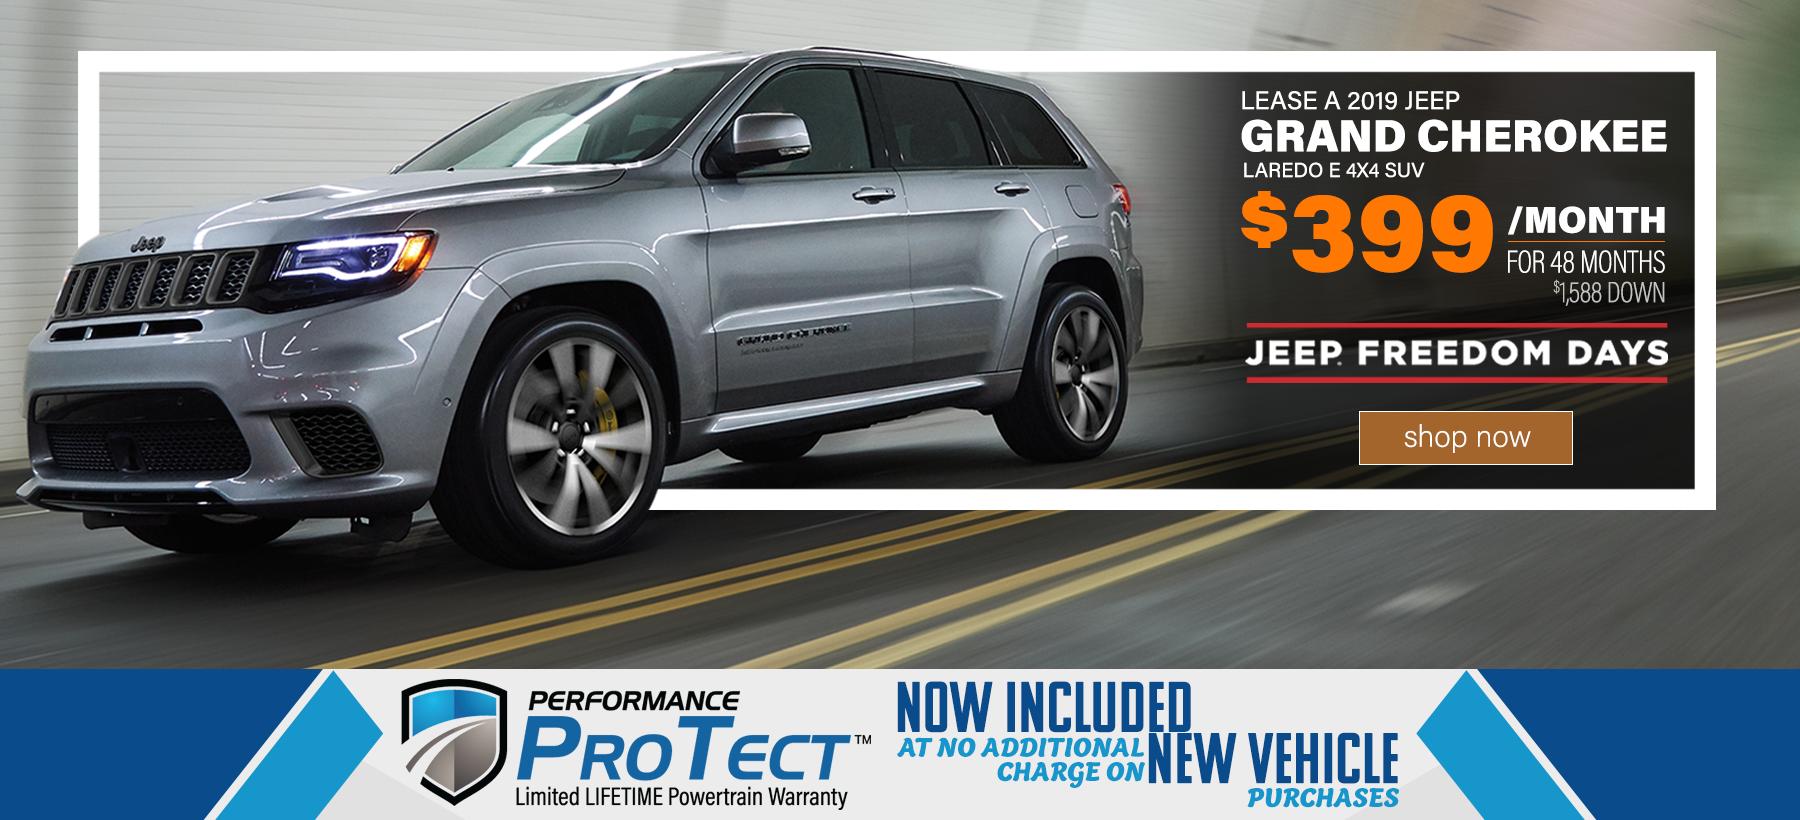 2019-jeep-grand-cherokee-lease-dayton-ohio